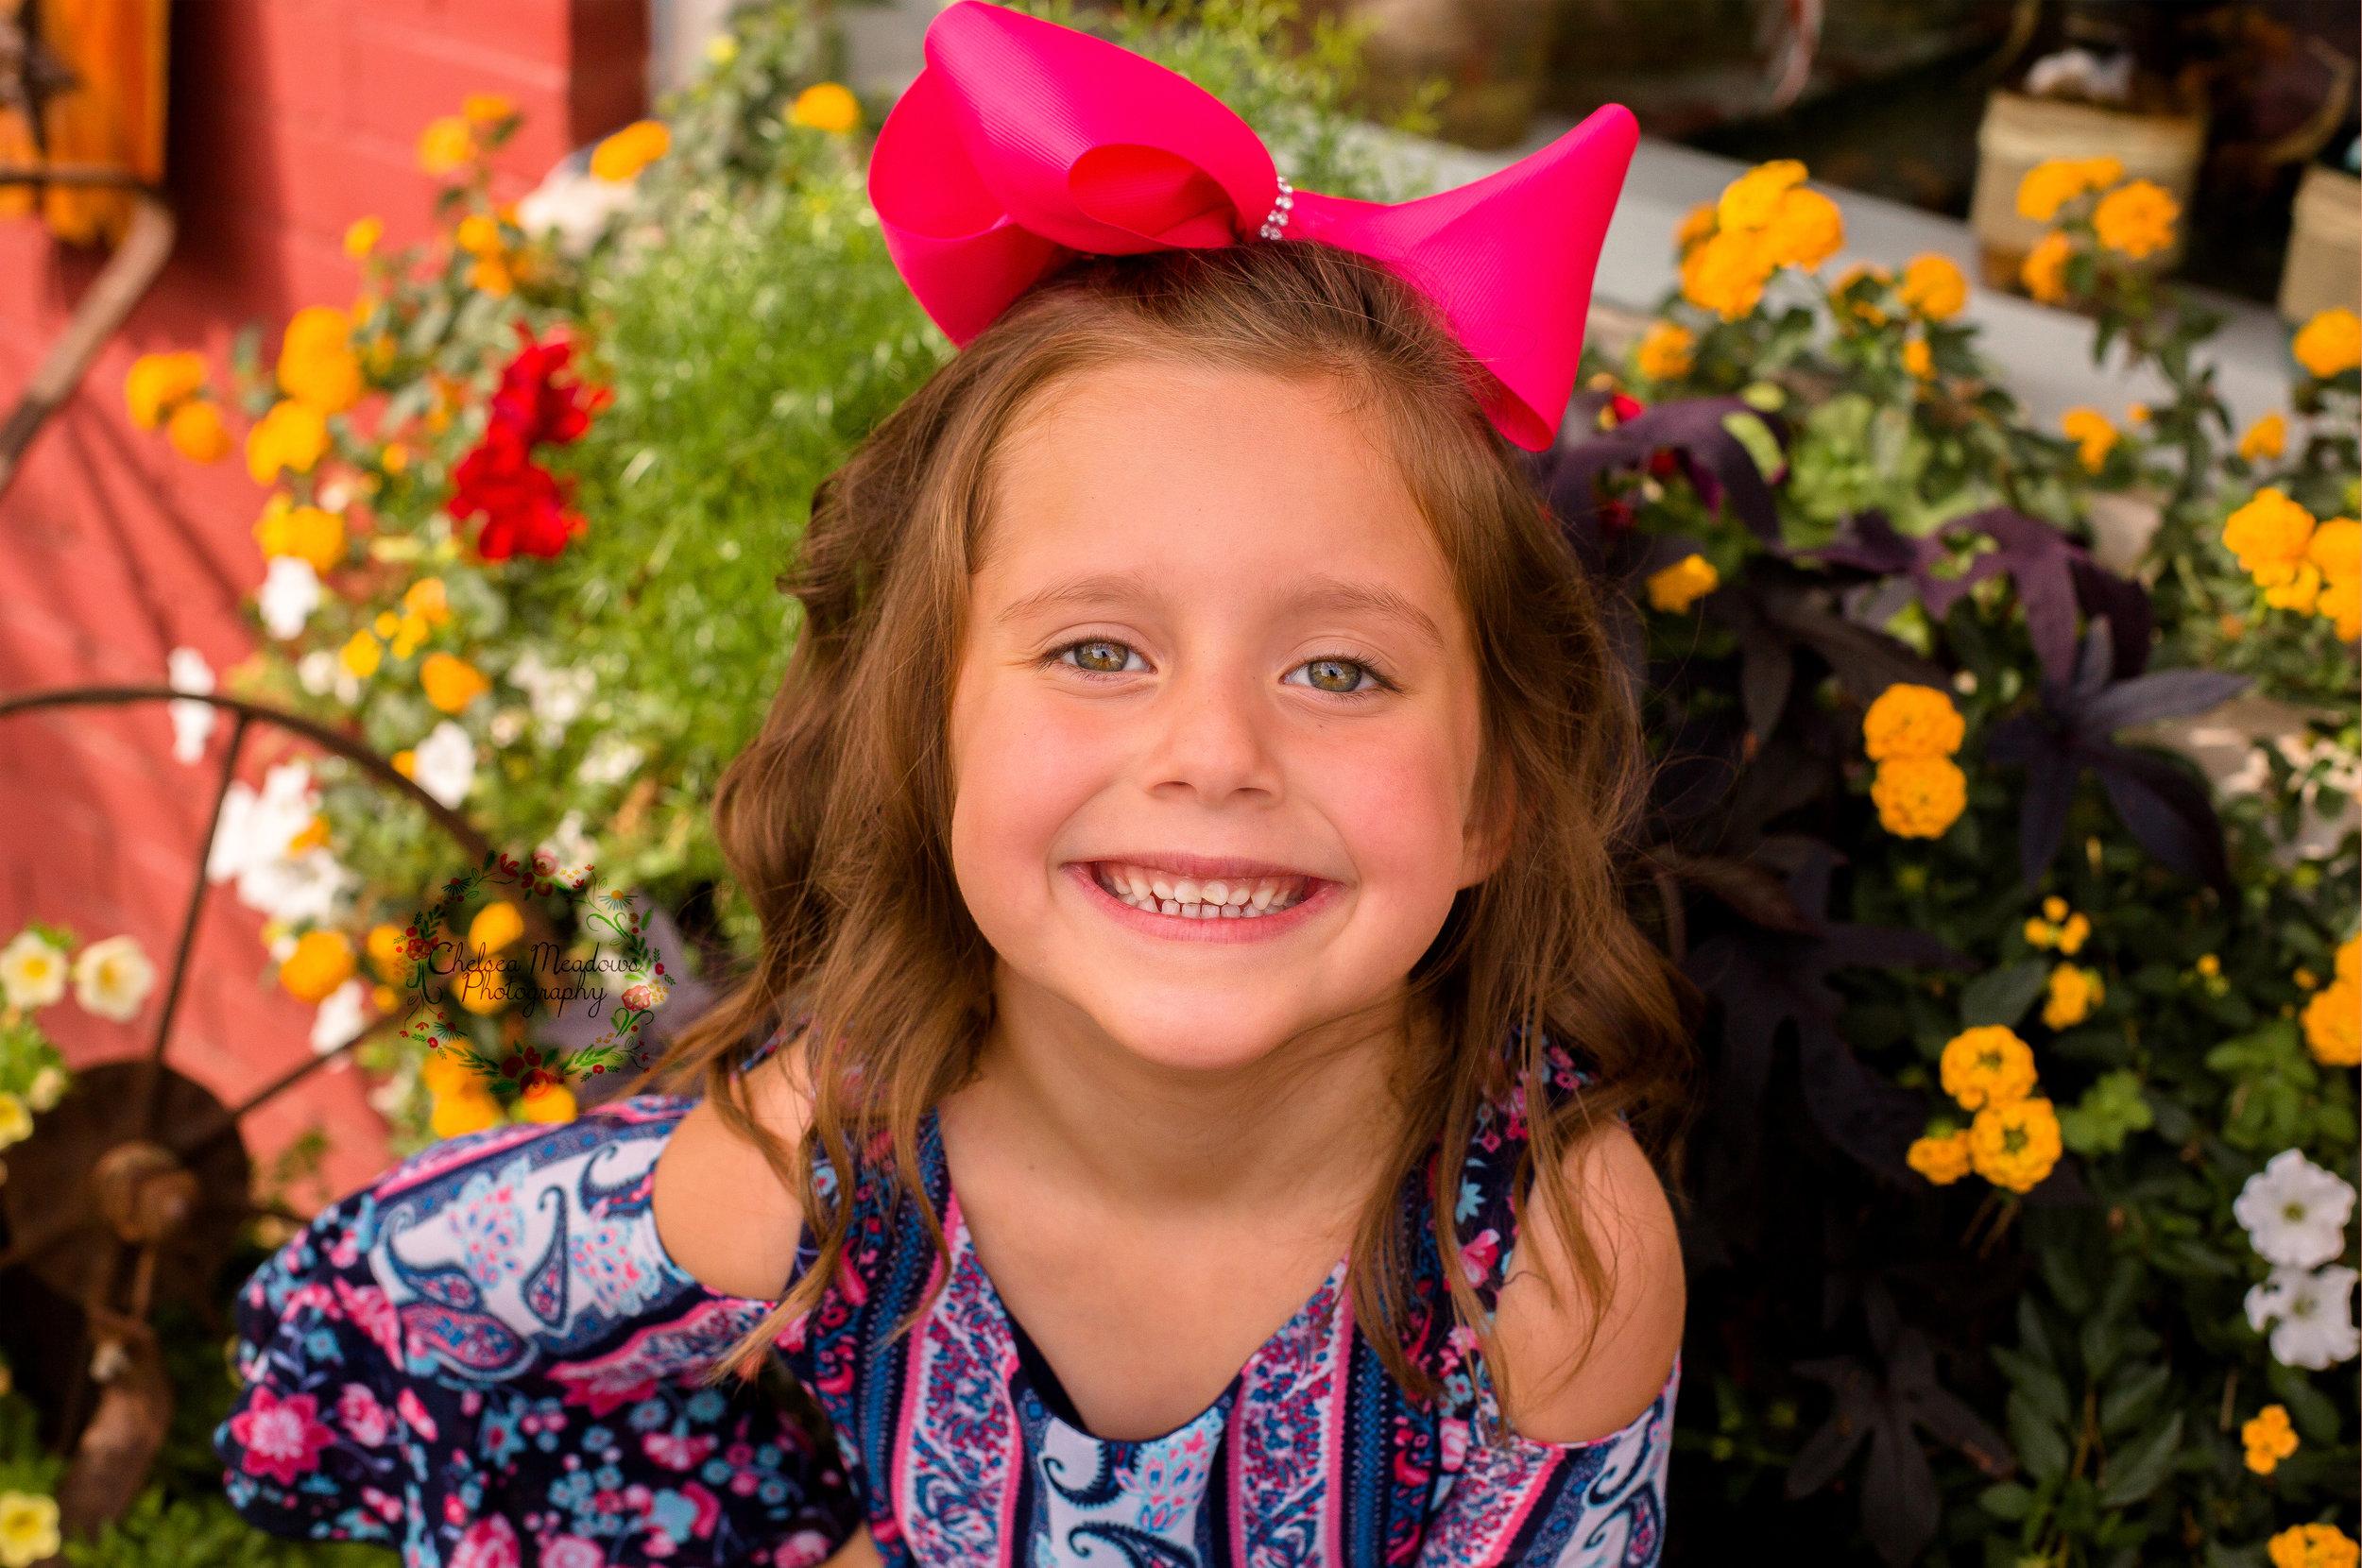 April 6th Birthday - Nashville Family Photographer - Chelsea Meadows Photography (30).jpg